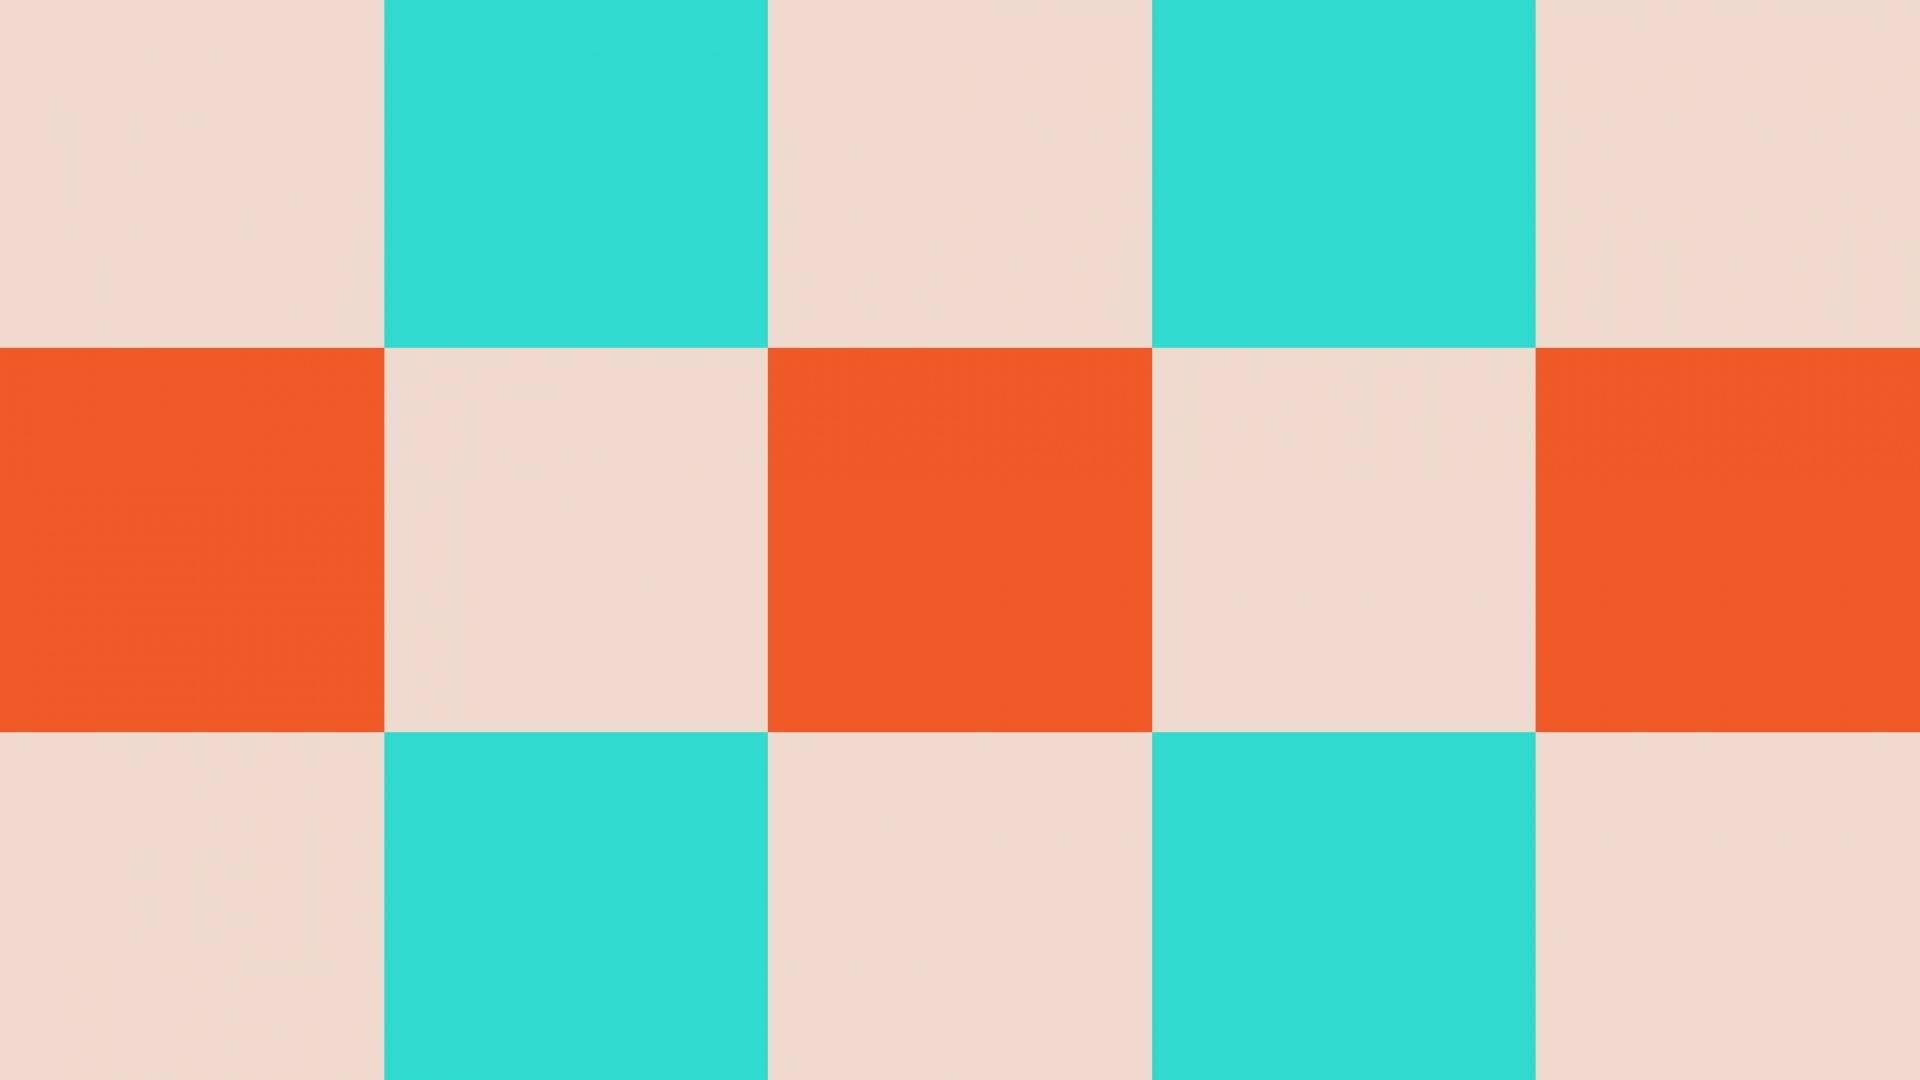 обои текстура, квадраты, голубой, розовый картинки фото